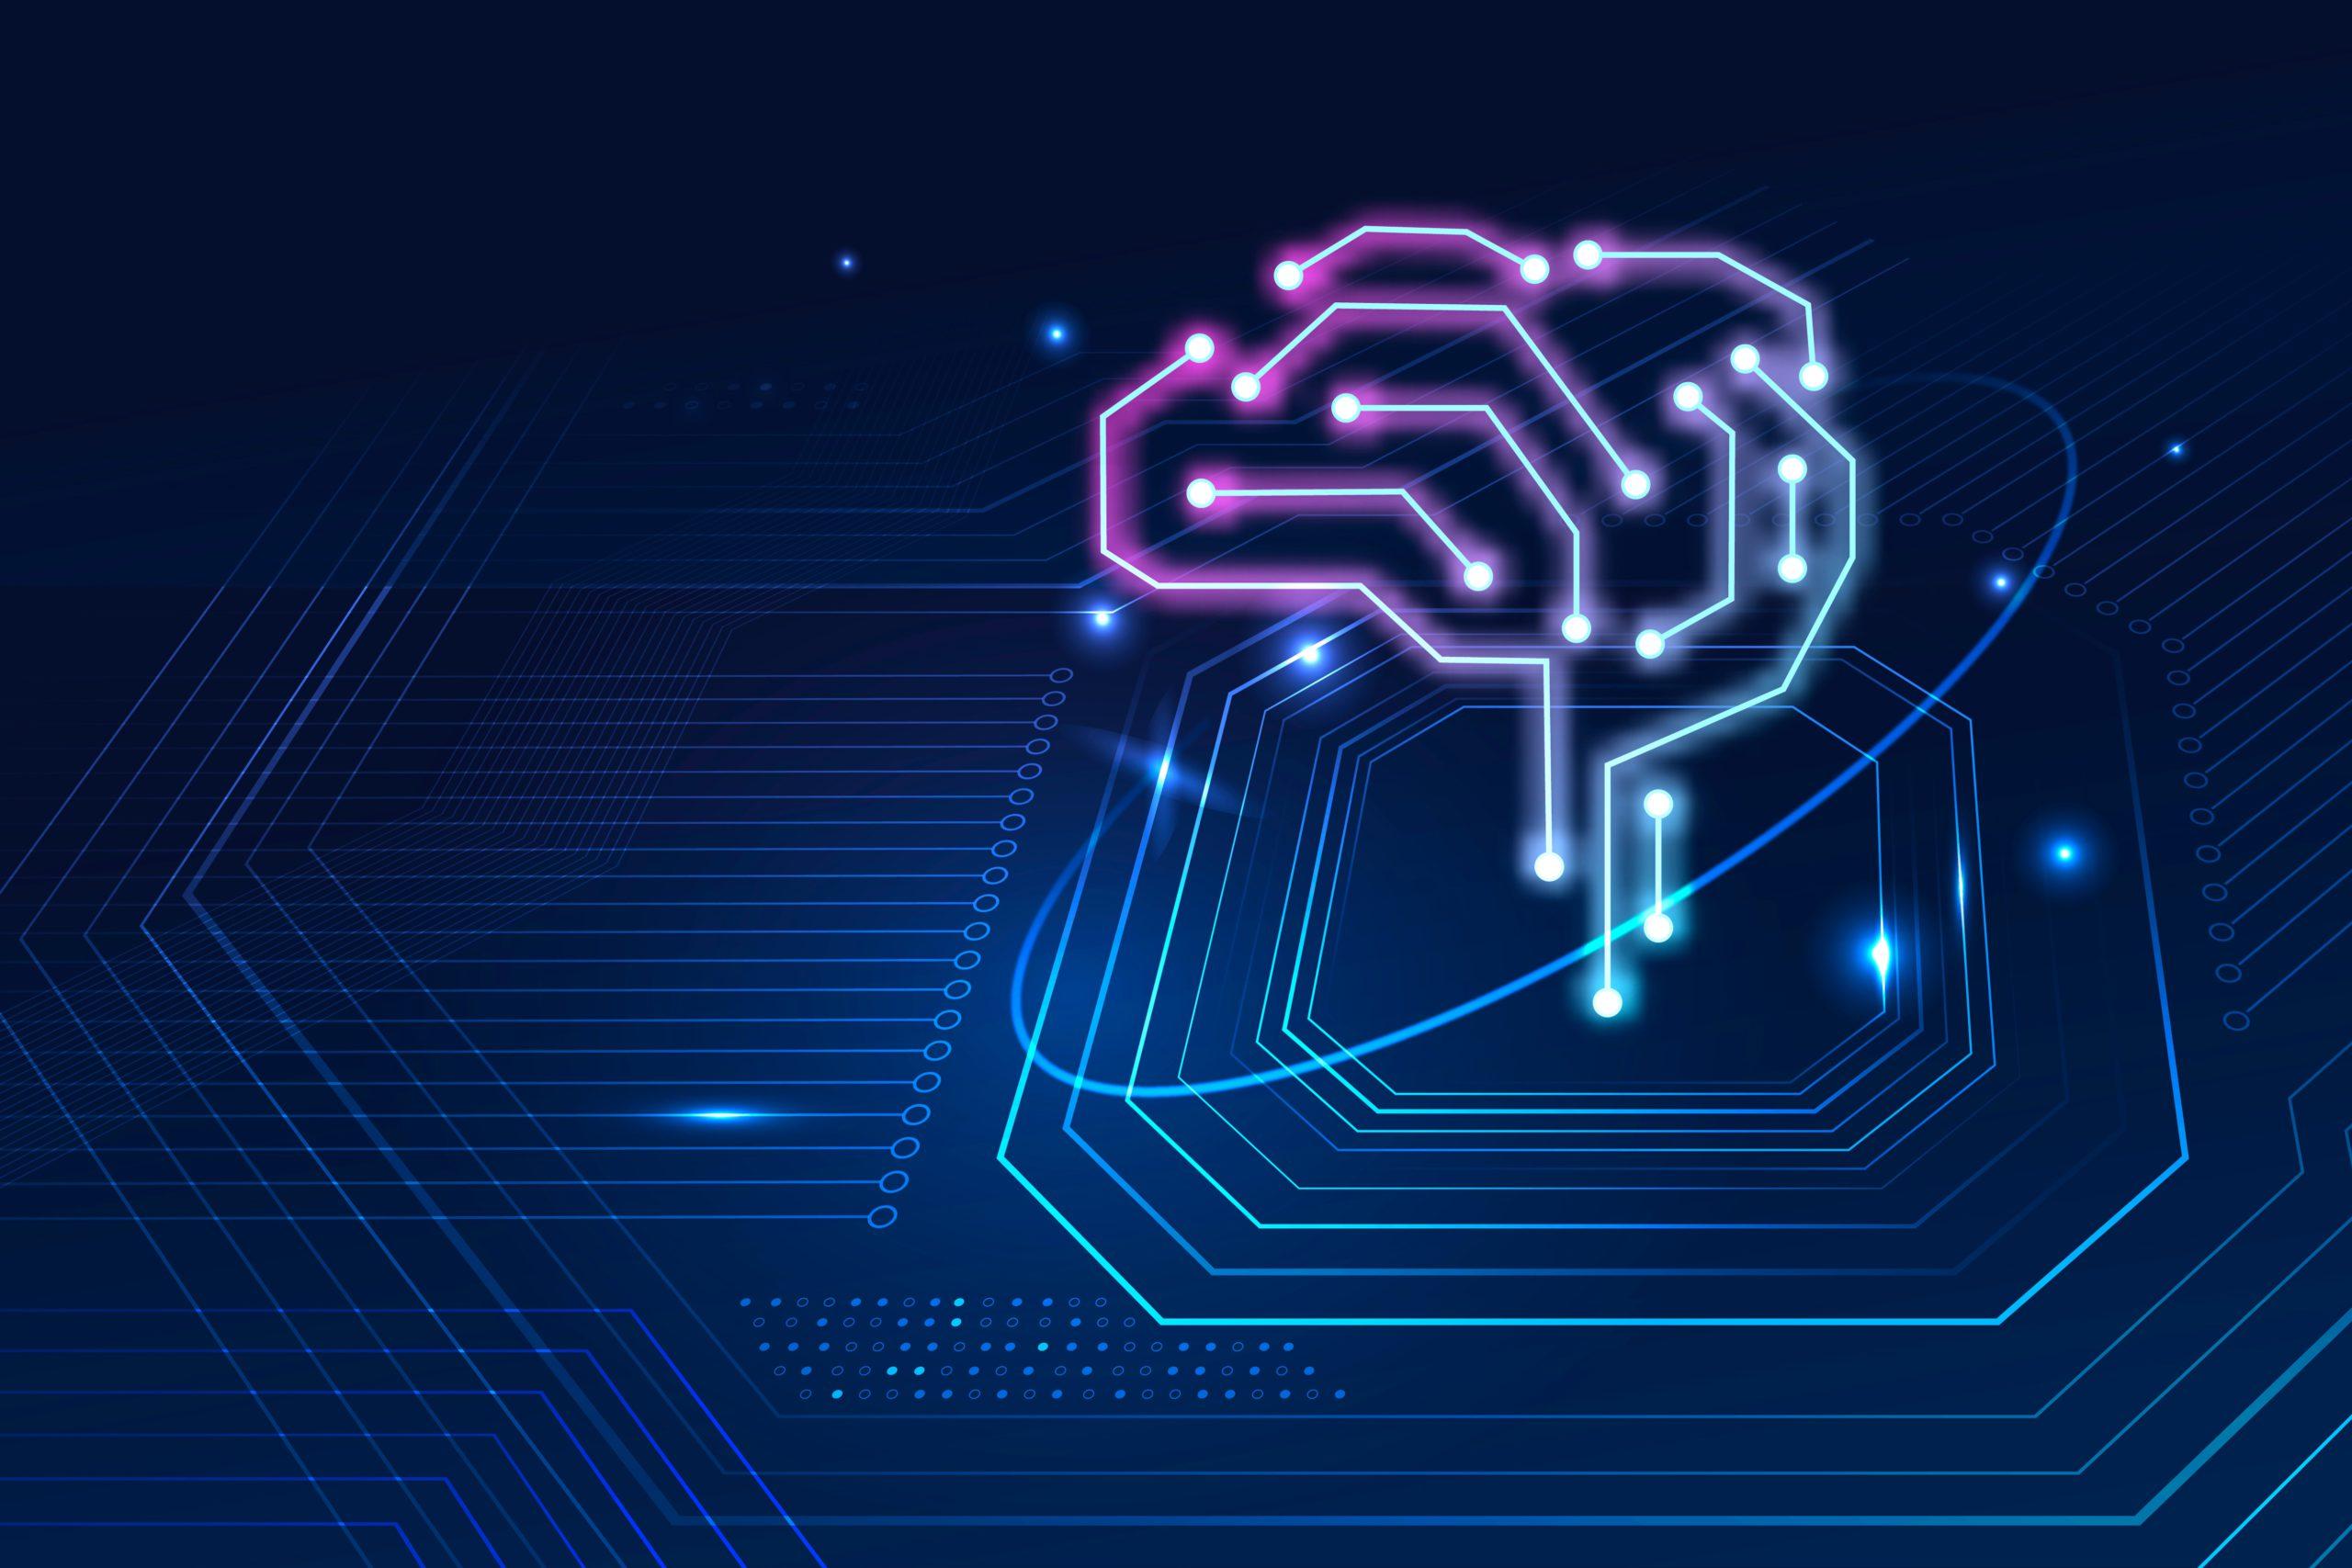 StashFin is using AI & ML to detect Frauds